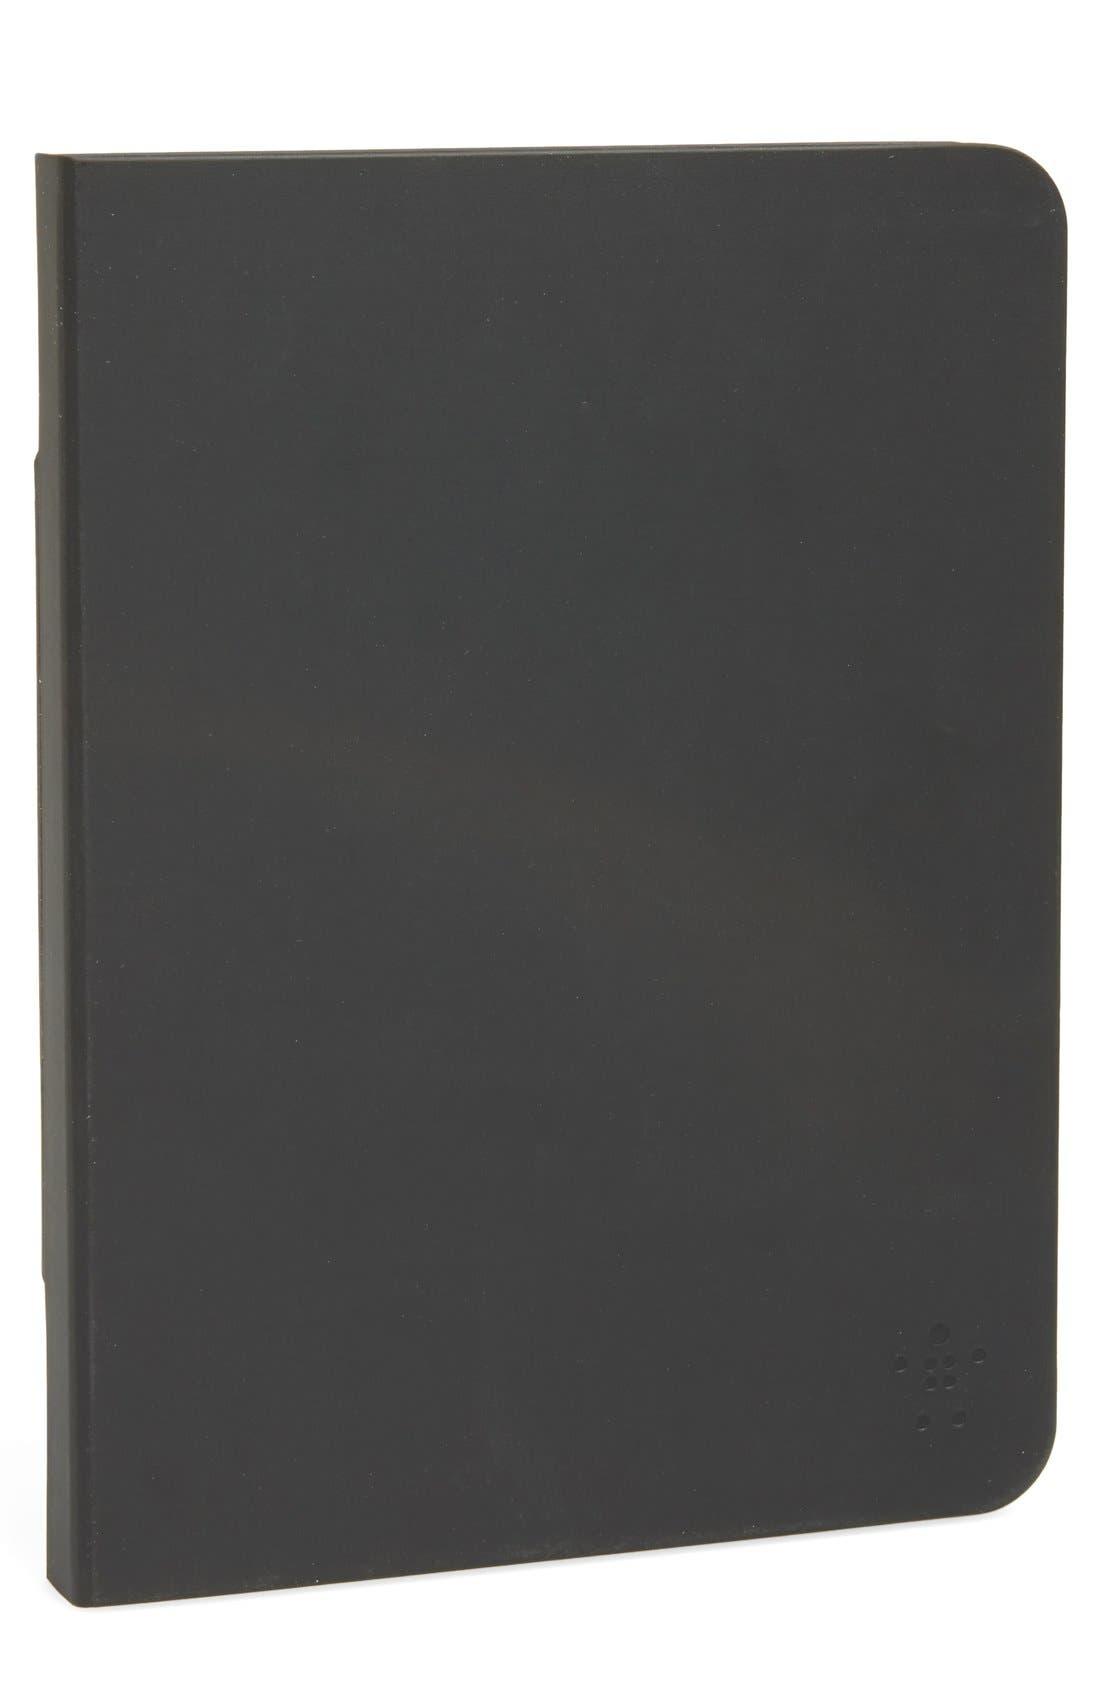 'Slim Style' iPad Air Keyboard Case,                             Alternate thumbnail 2, color,                             001